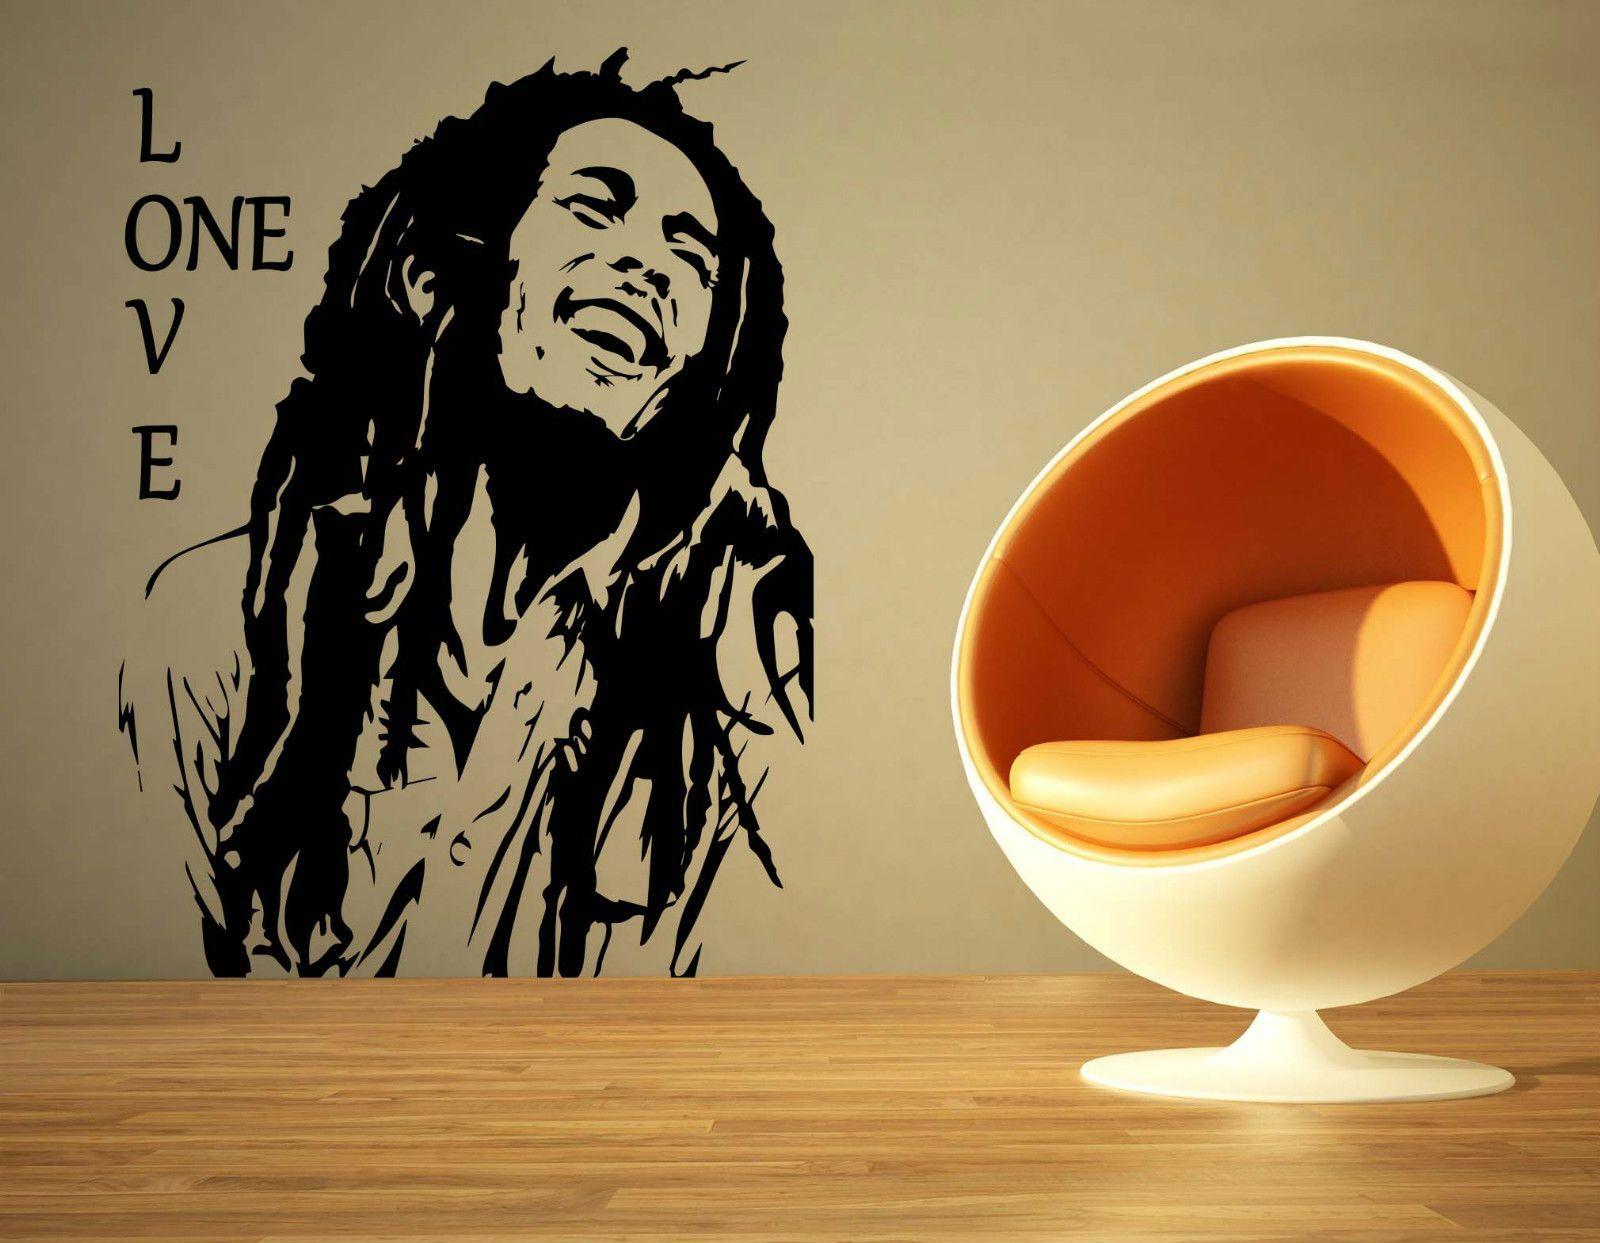 Bob Marley Music One Love Reggae Rasta Album Wall Art Sticker | Bob ...